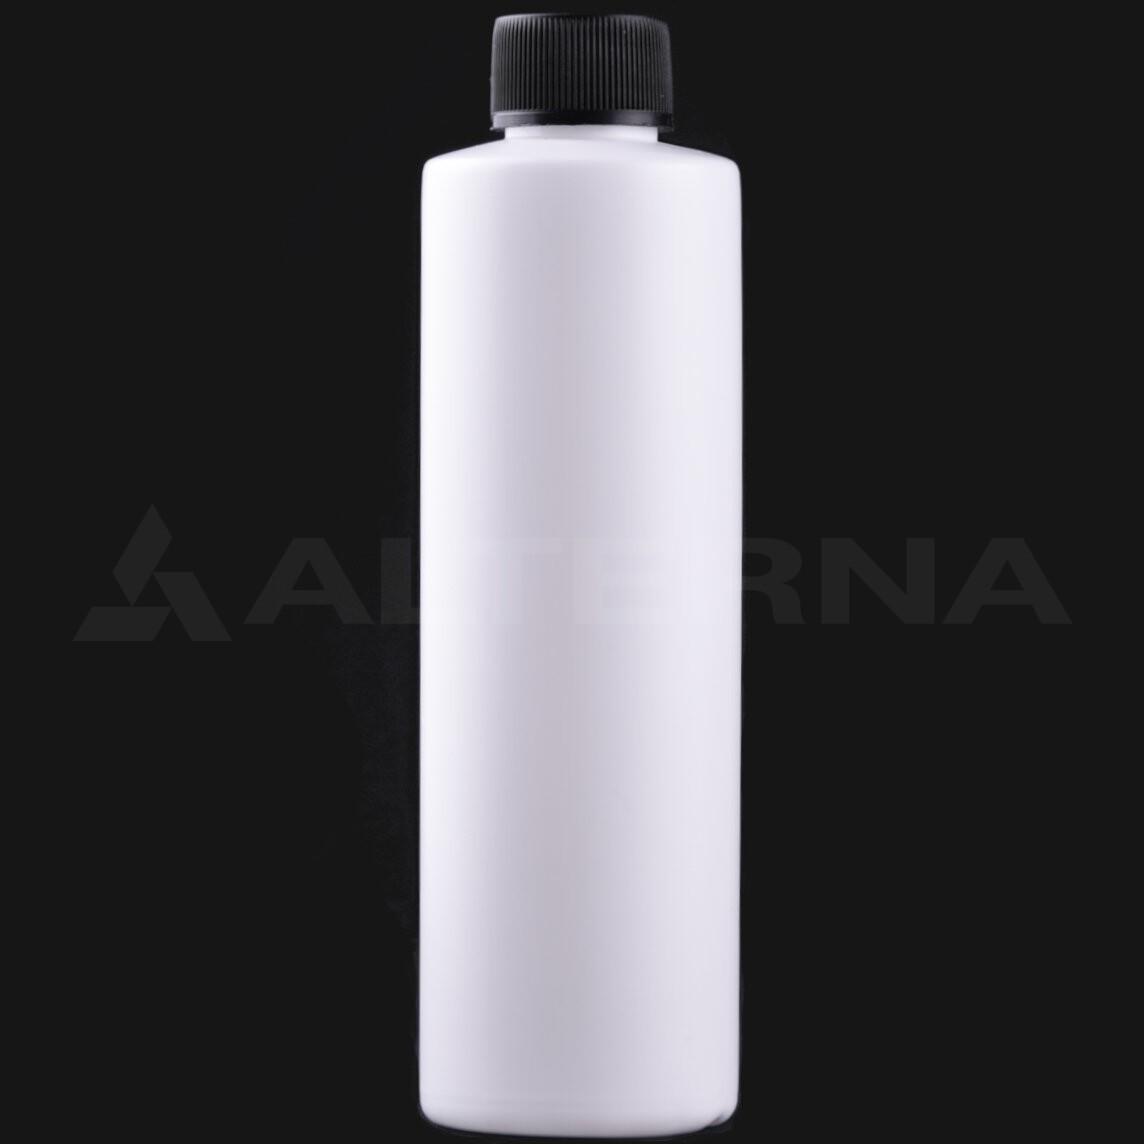 250 ml HDPE Bottle with 24 mm Foam Seal Cap